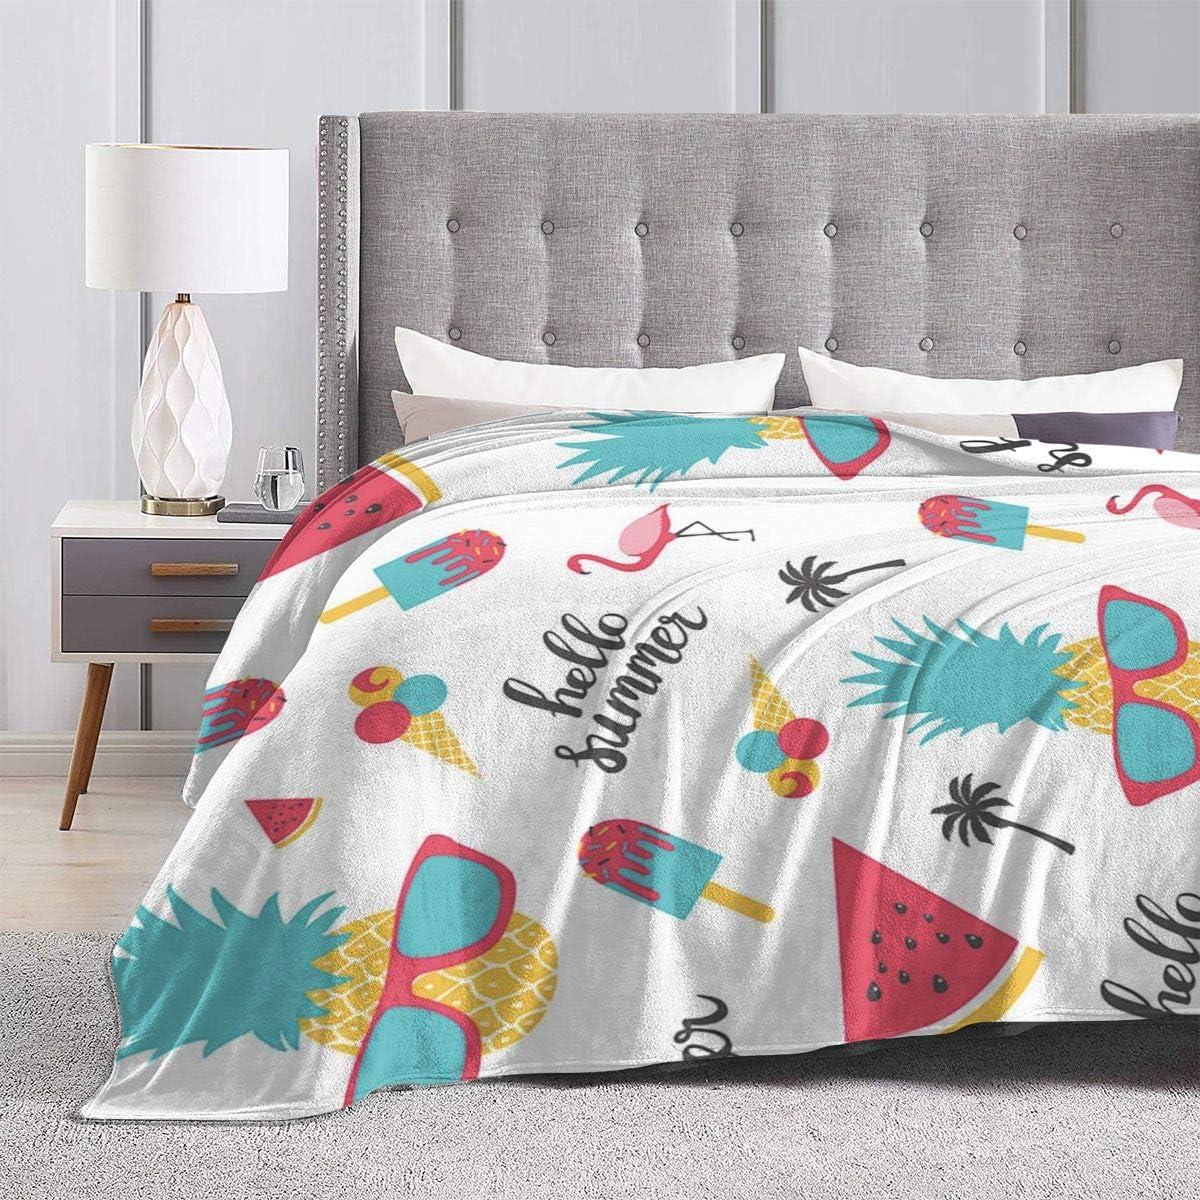 AUISS Plush Throw Velvet Blanket Hello Summer Pineapple Fluffy Fleece Carpet Chair Lounging for Women Luxurious Sleep Mat Pad Flannel Cover for Fall